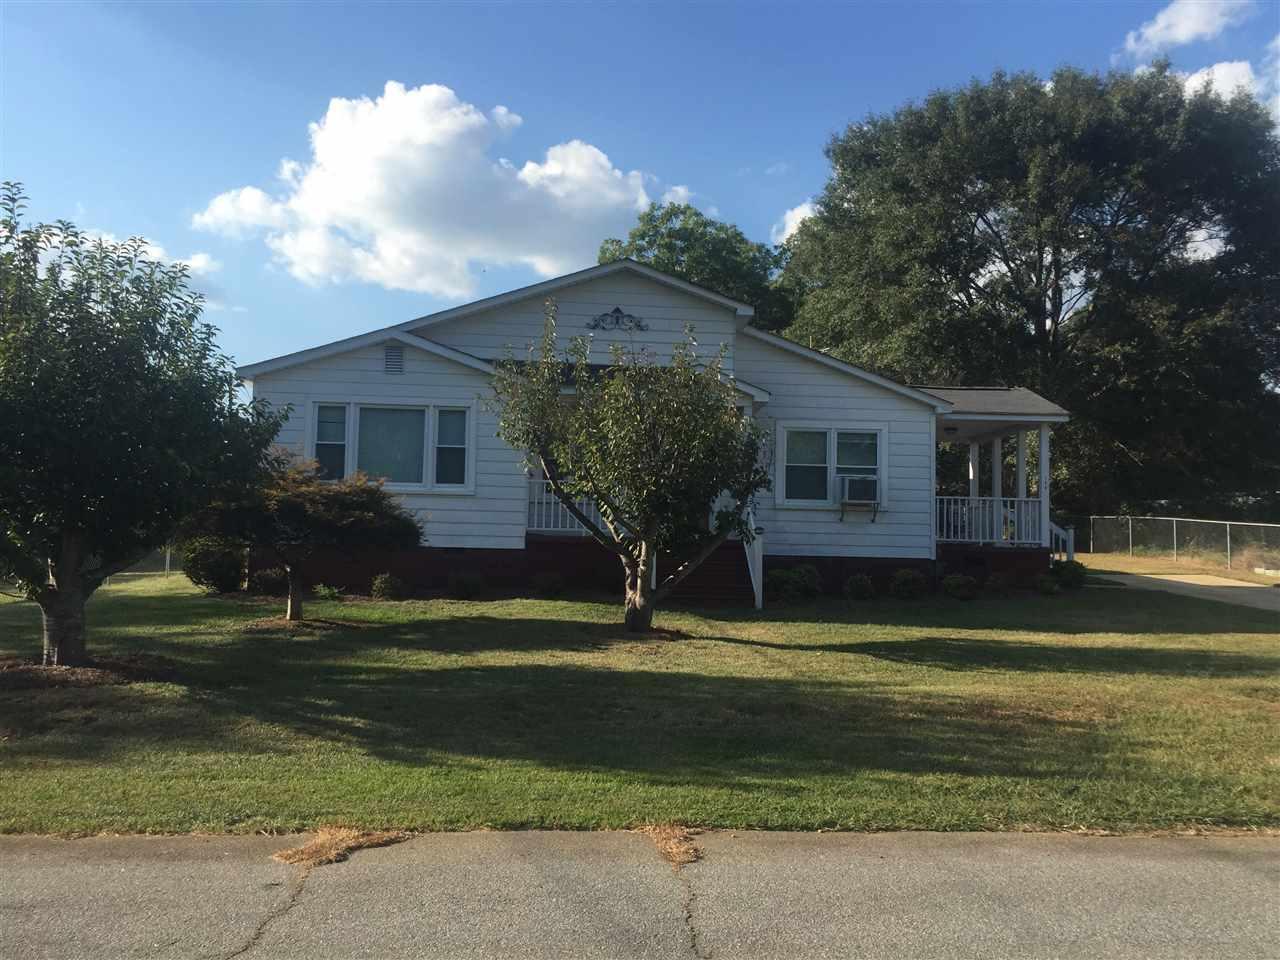 104 Wilson Ave, Liberty, SC 29657 (MLS #20180545) :: Les Walden Real Estate